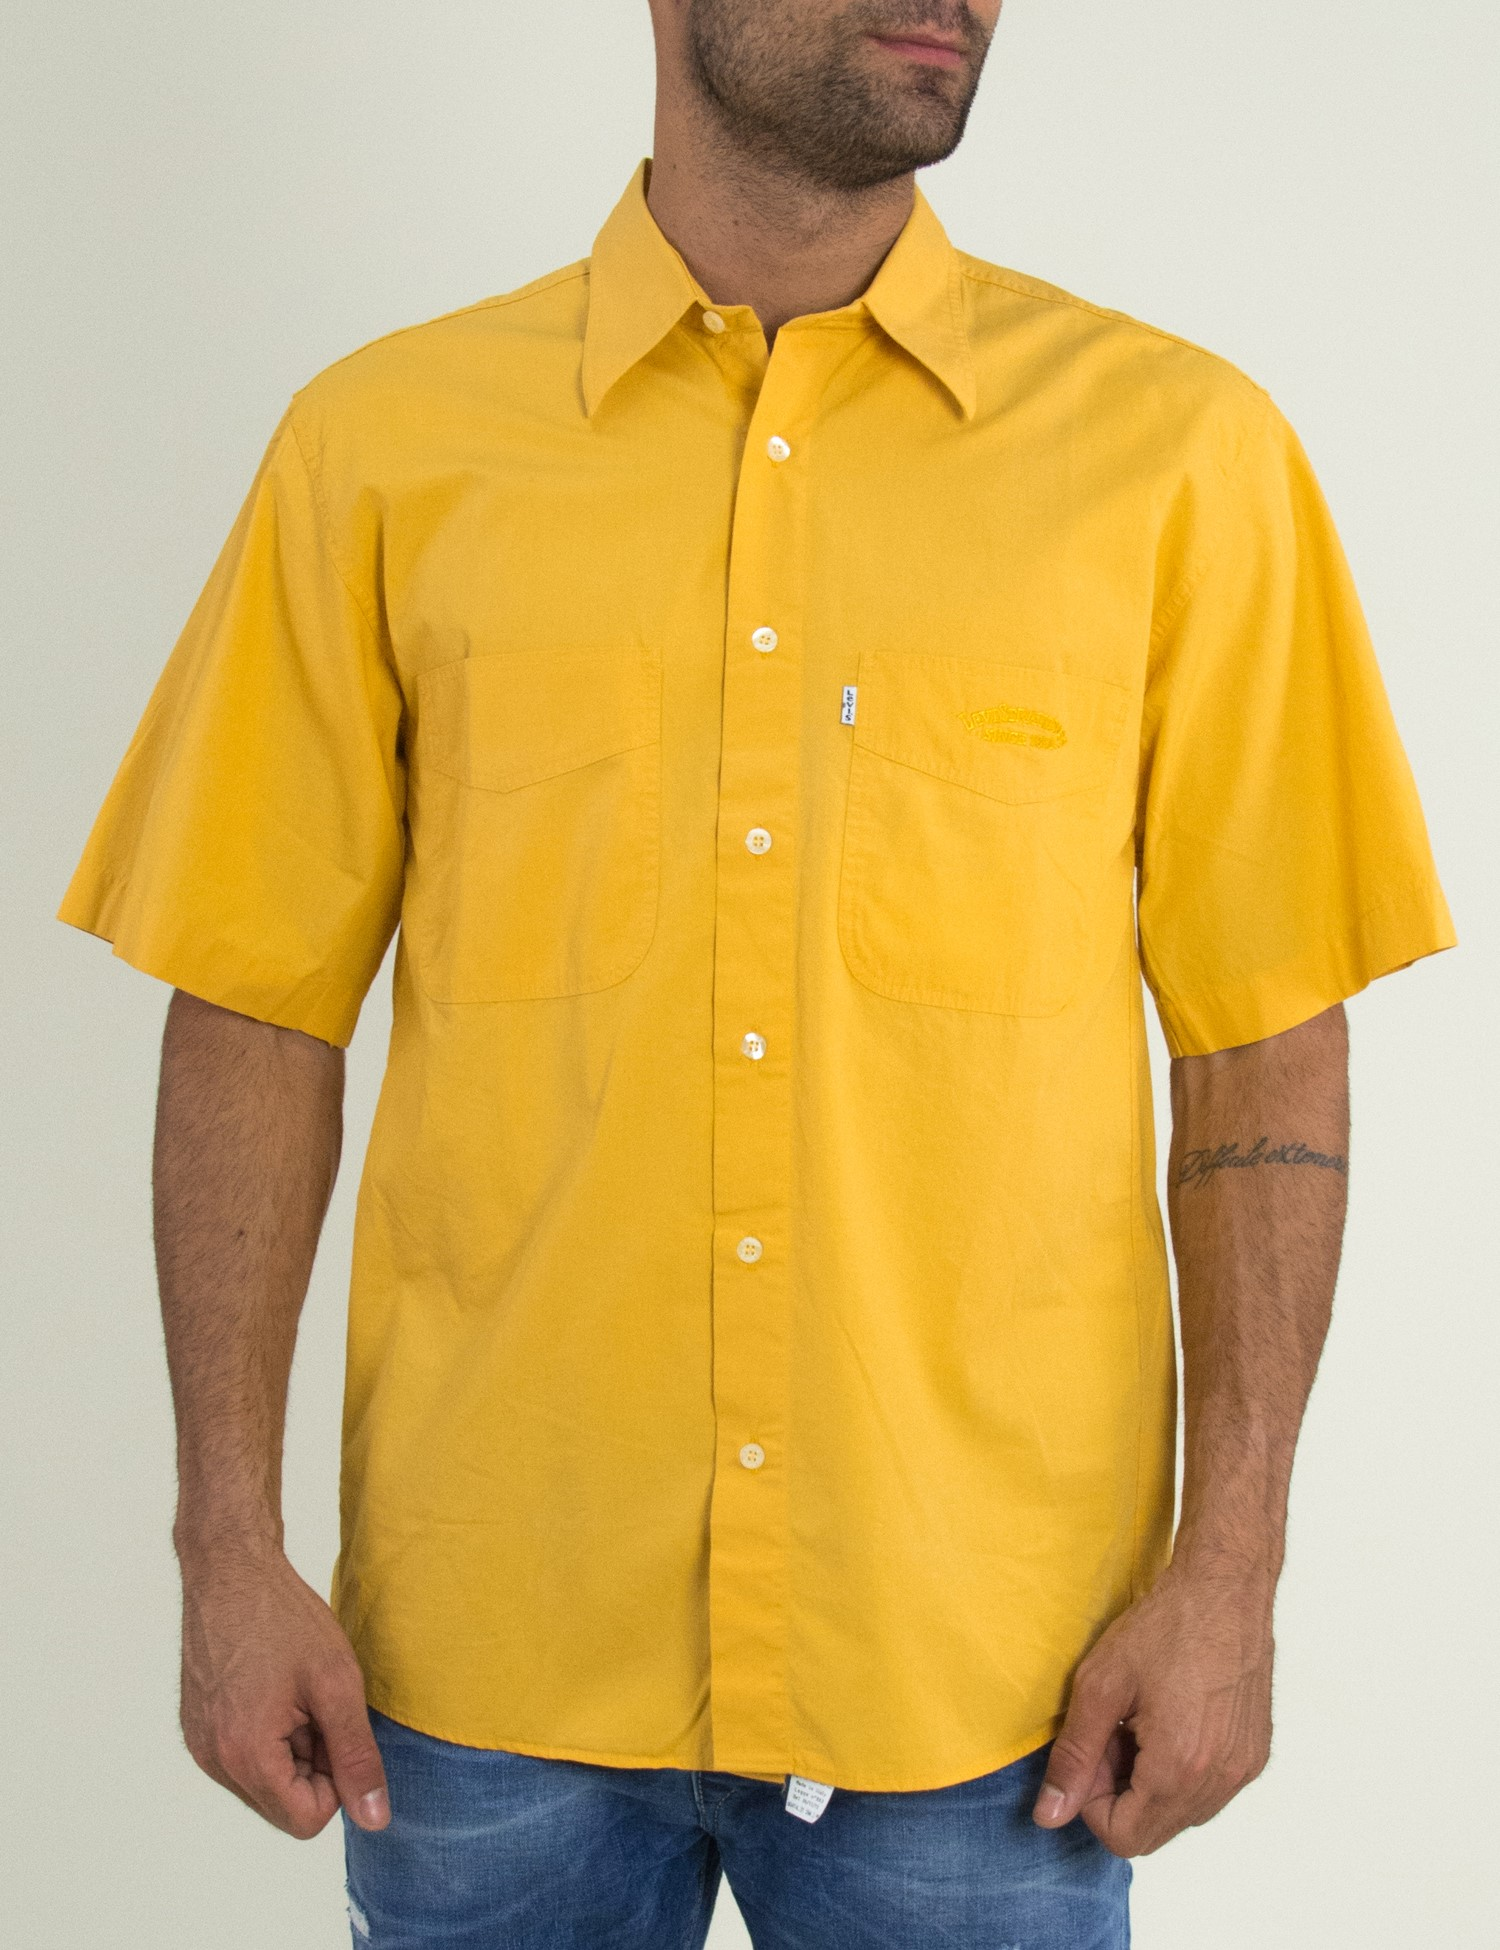 548ae0ab48d2 Ανδρικό κοντομάνικο πουκάμισο Levis κίτρινο 69356